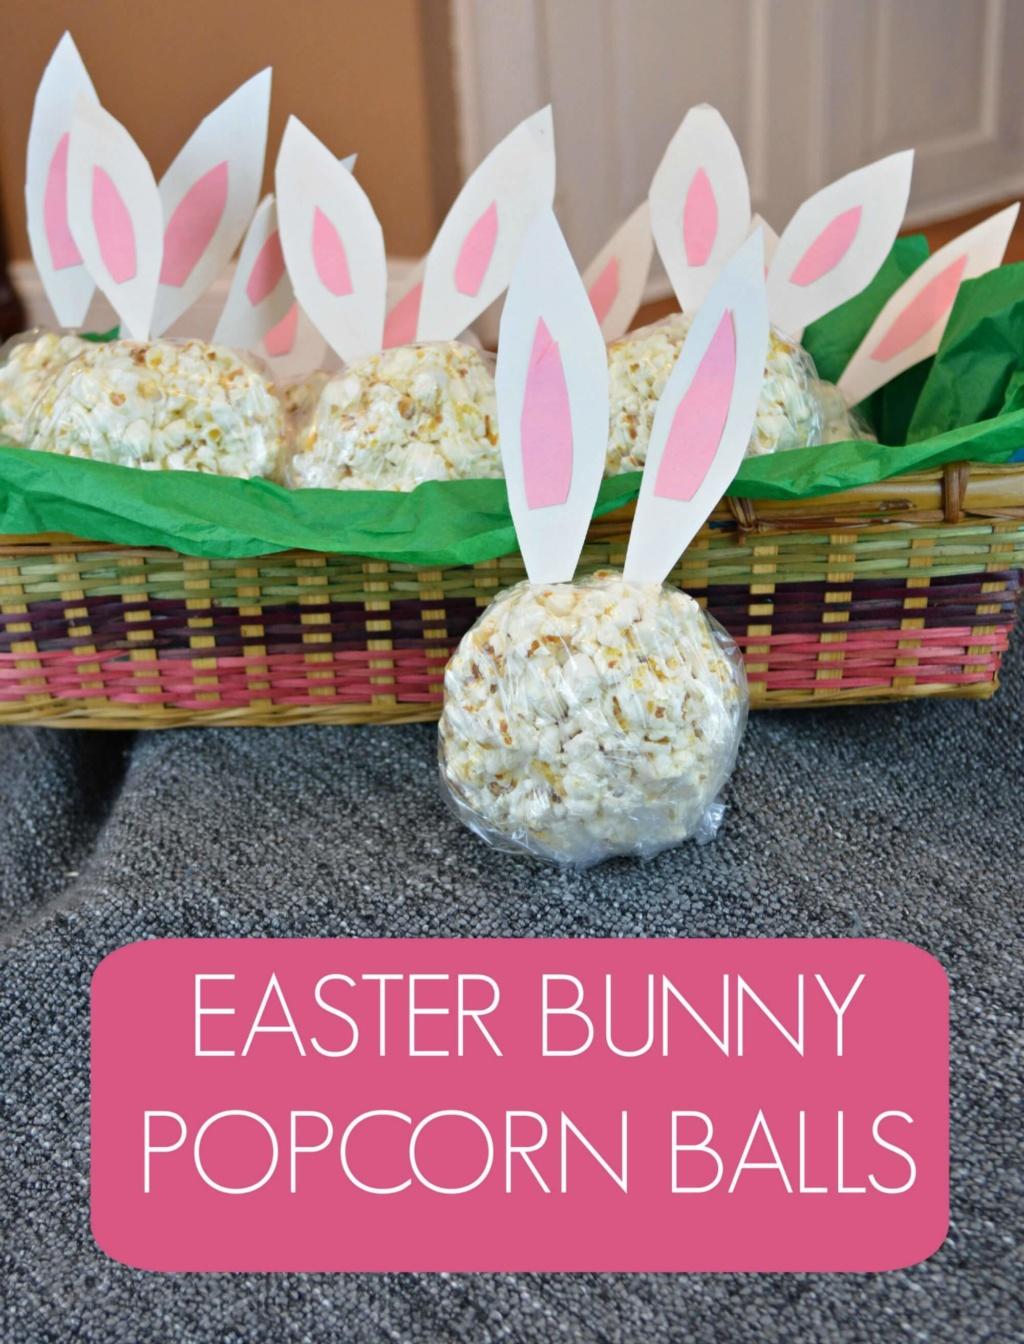 Easter Bunny Popcorn Balls